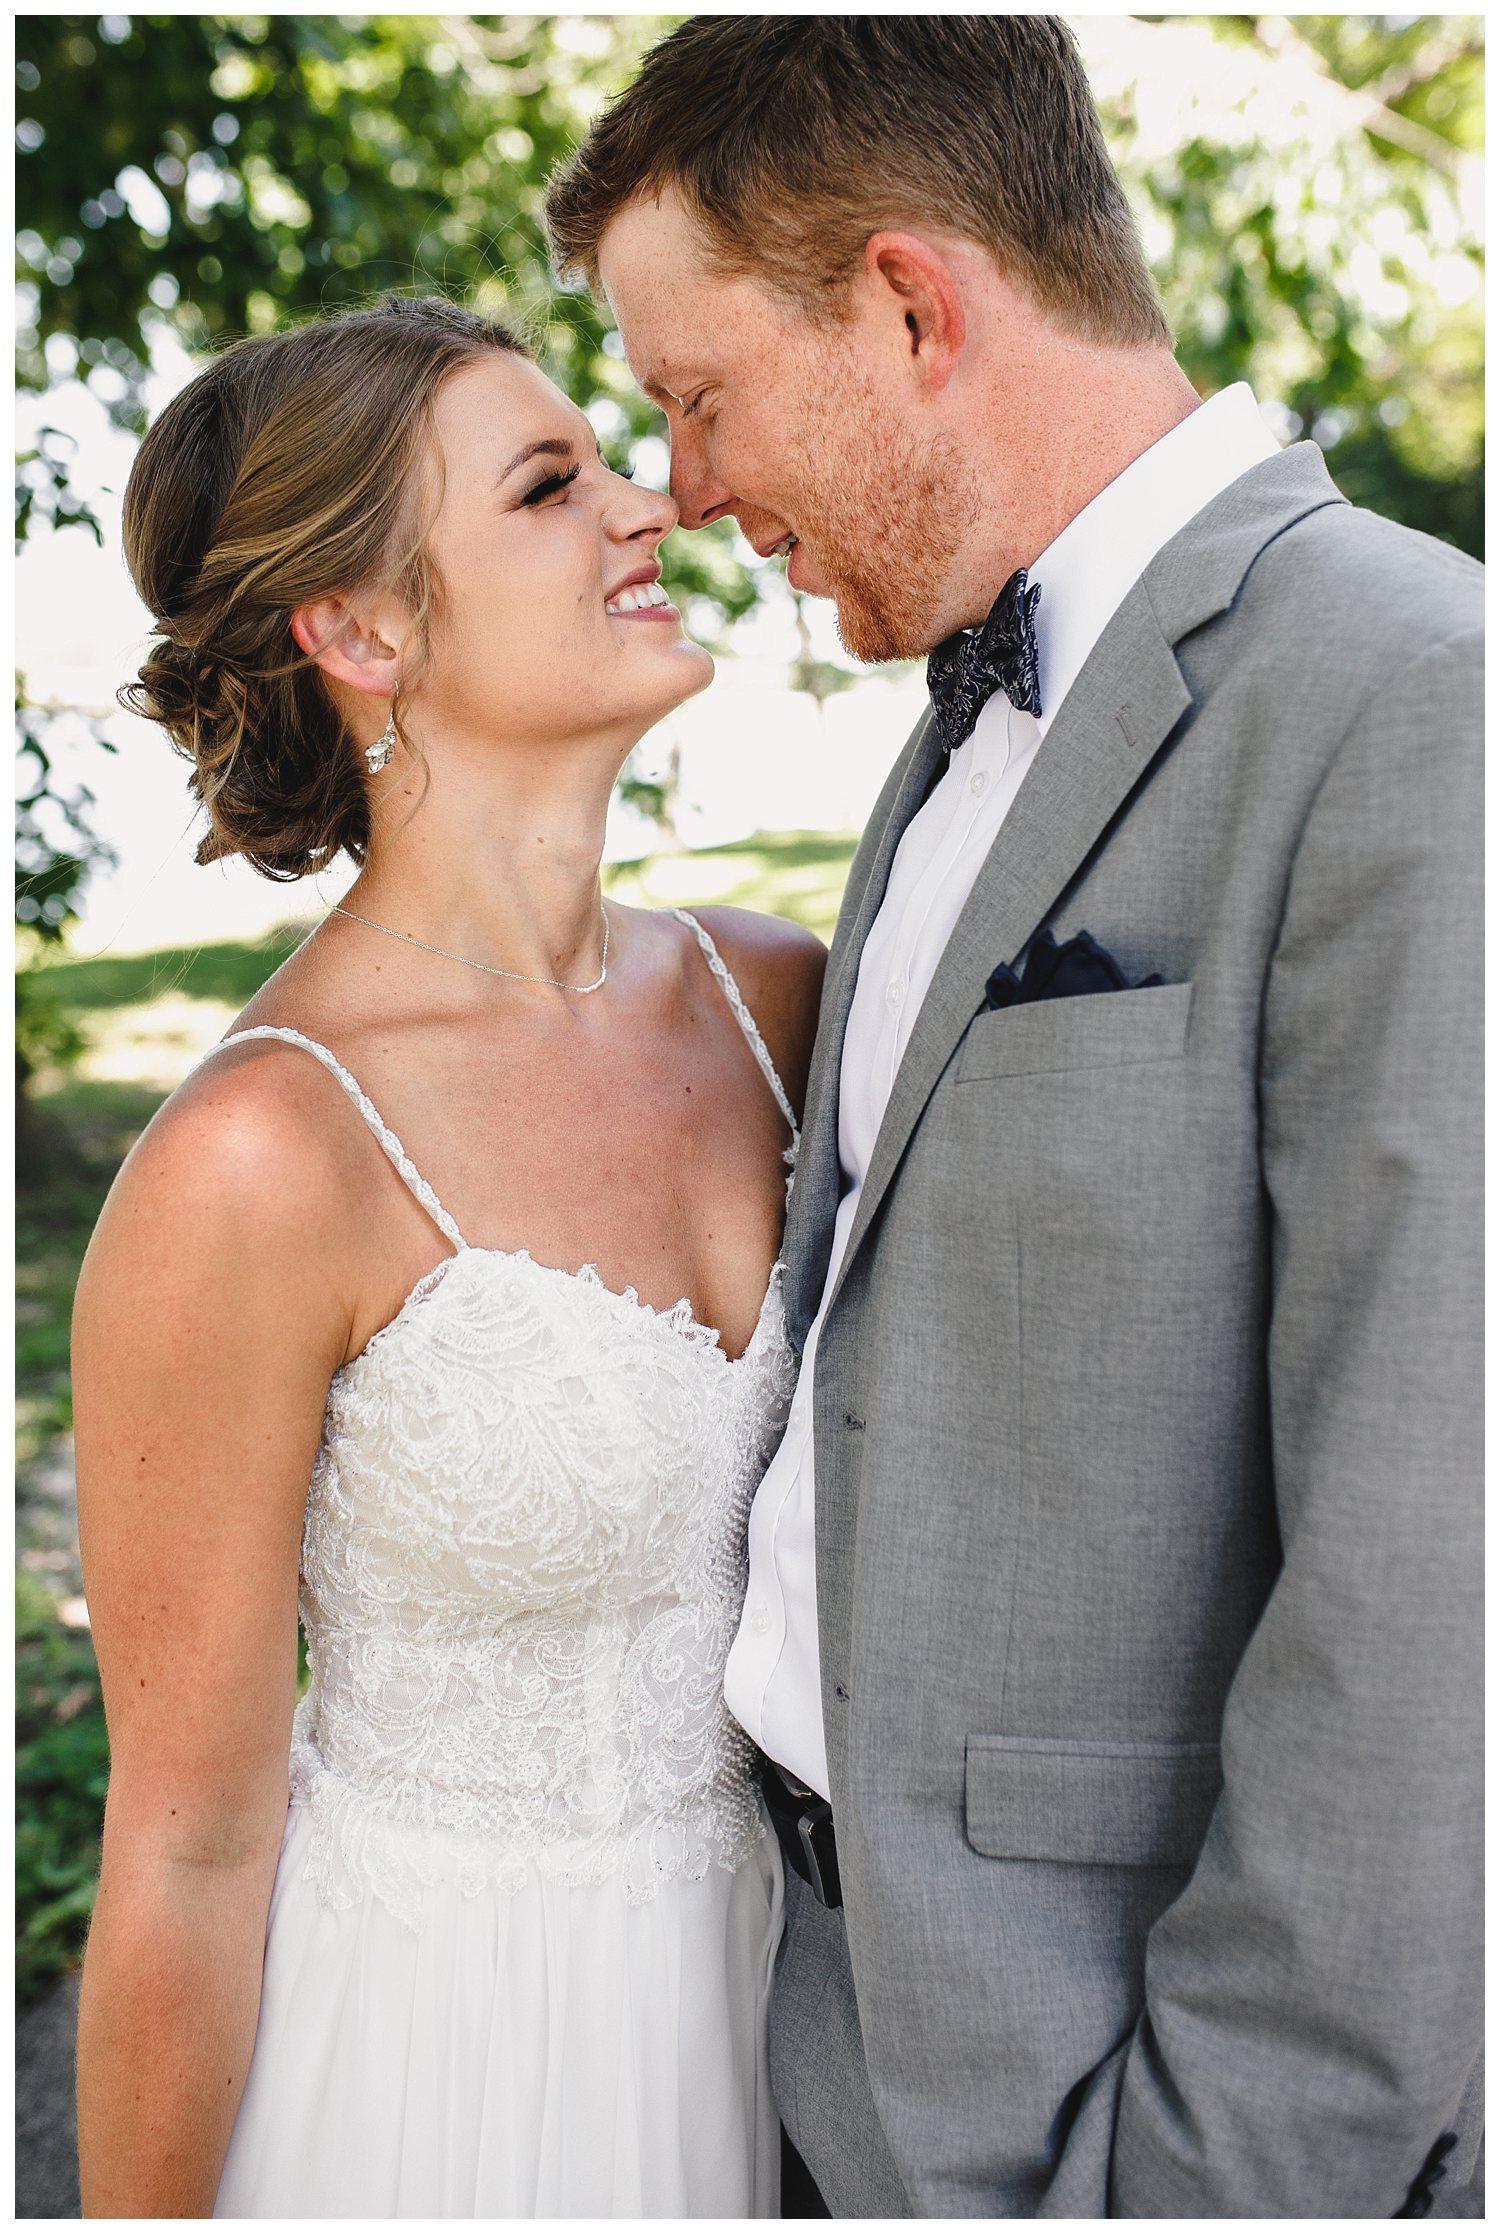 Kelsey_Diane_Photography_Kansas_City_Engagement_Wedding_Photographer_Midwest_Traveling_Missouri_Lee_Andrew_Hall_And_Garden_Blue_Springs_Wedding_Clayton_Kimberly_Summer_Wedding_0819.jpg